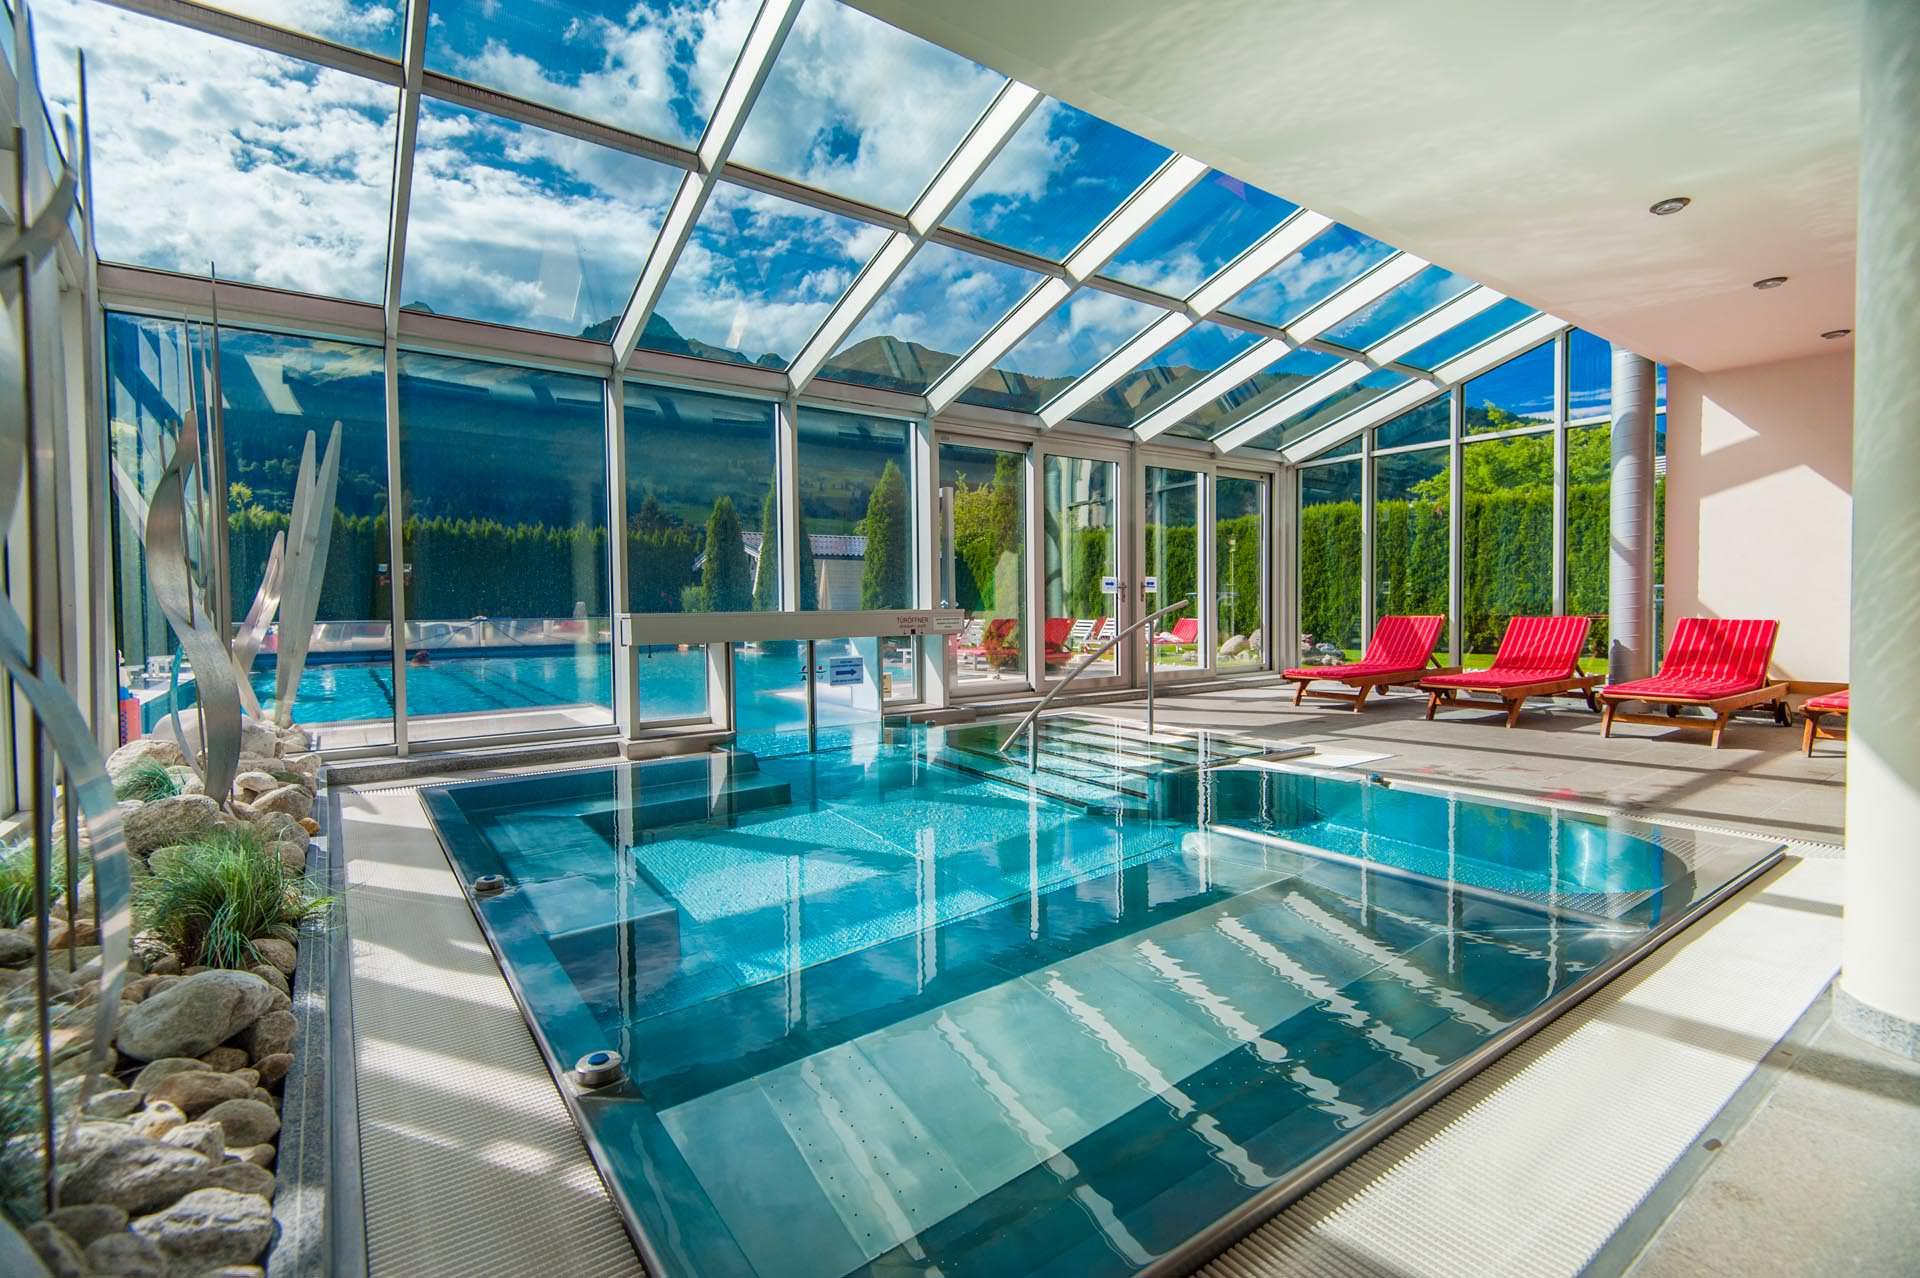 Wellnesshotel in bad hofgastein 4 s impuls hotel tirol for Design hotel tirol wellness